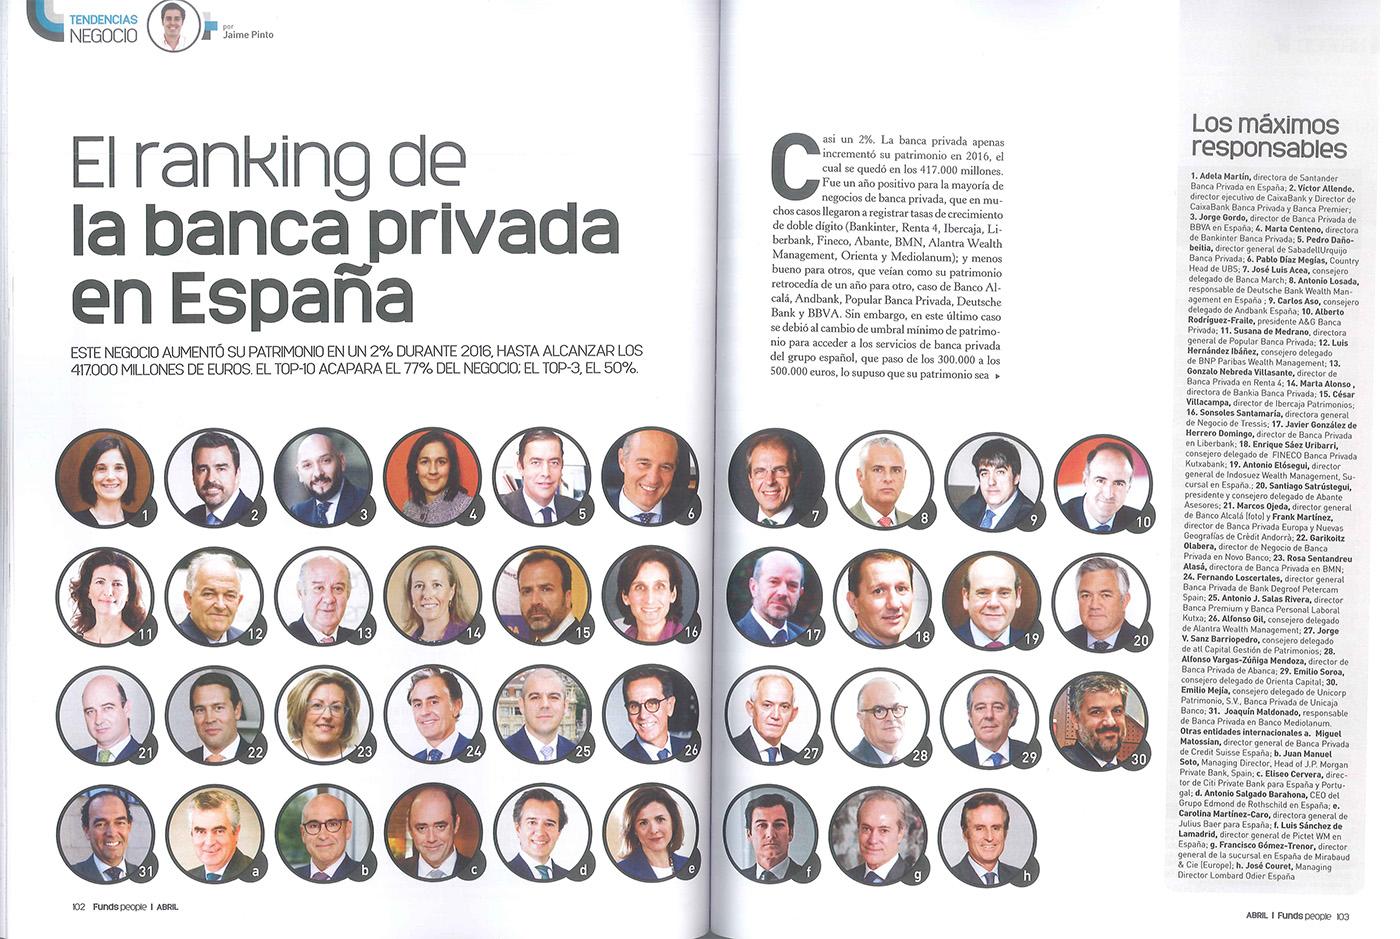 201704 Funds Ranking banca privada 1